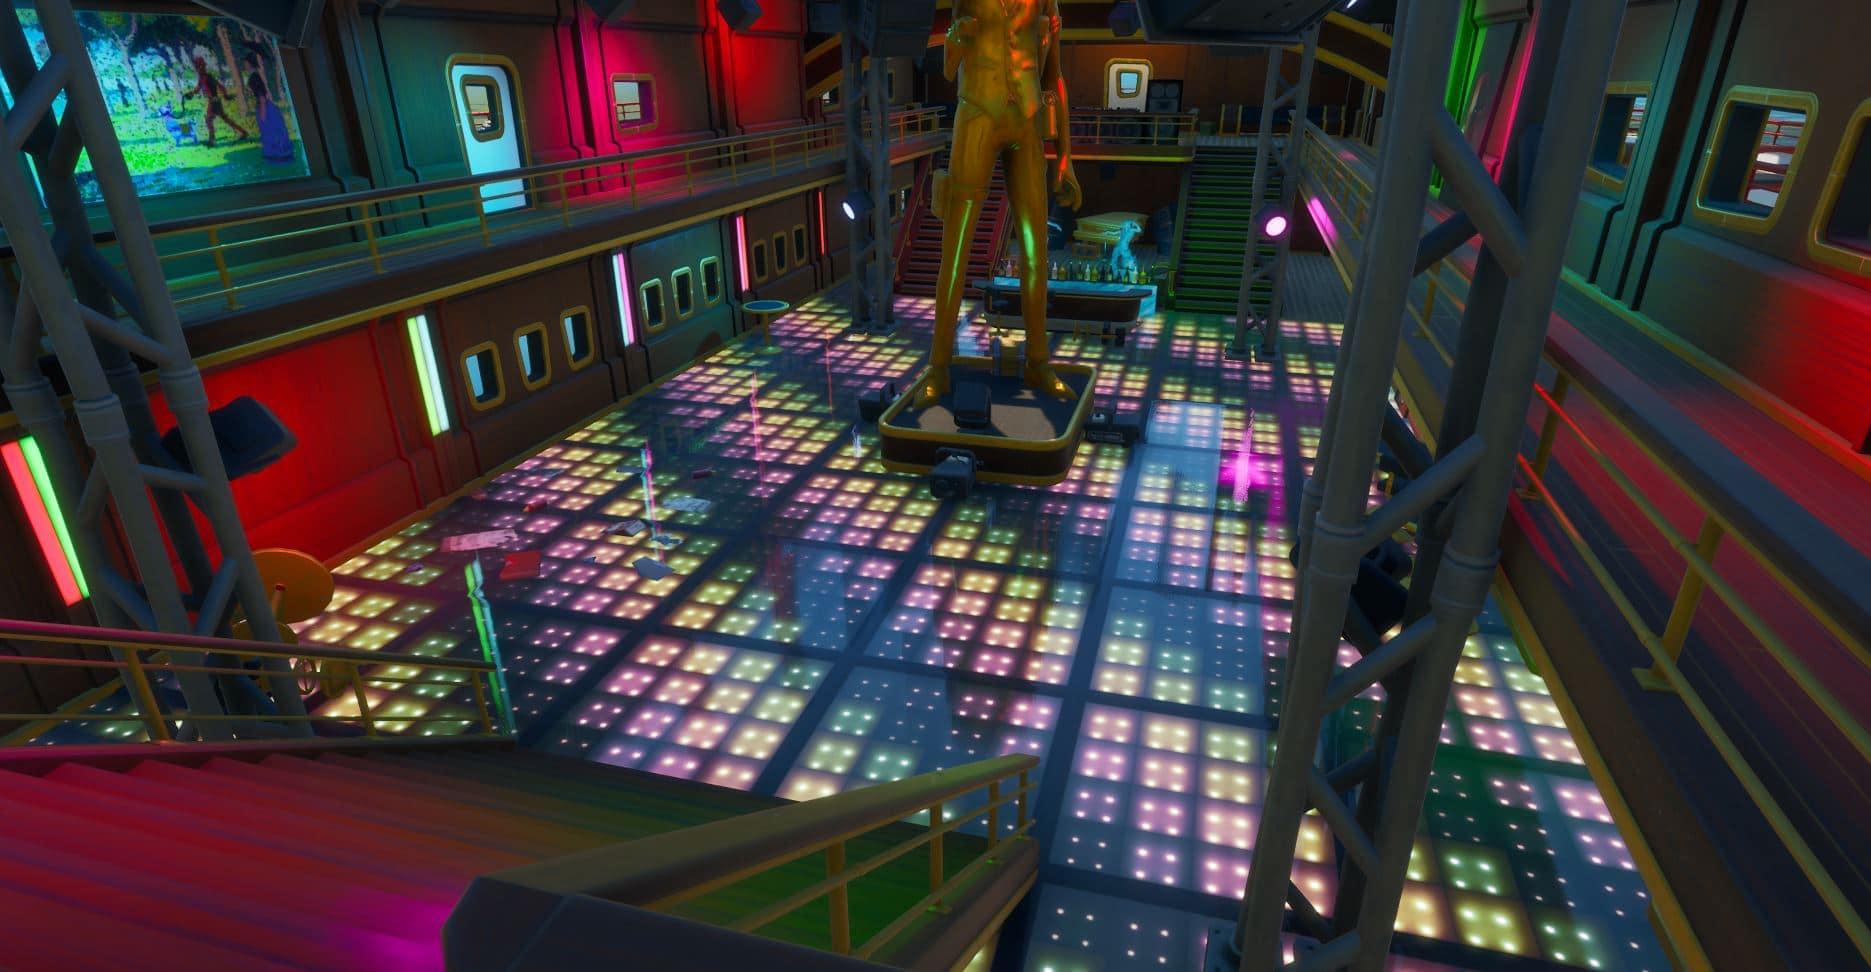 Fortnite Dance Floor Location - The Yacht Dance Floor